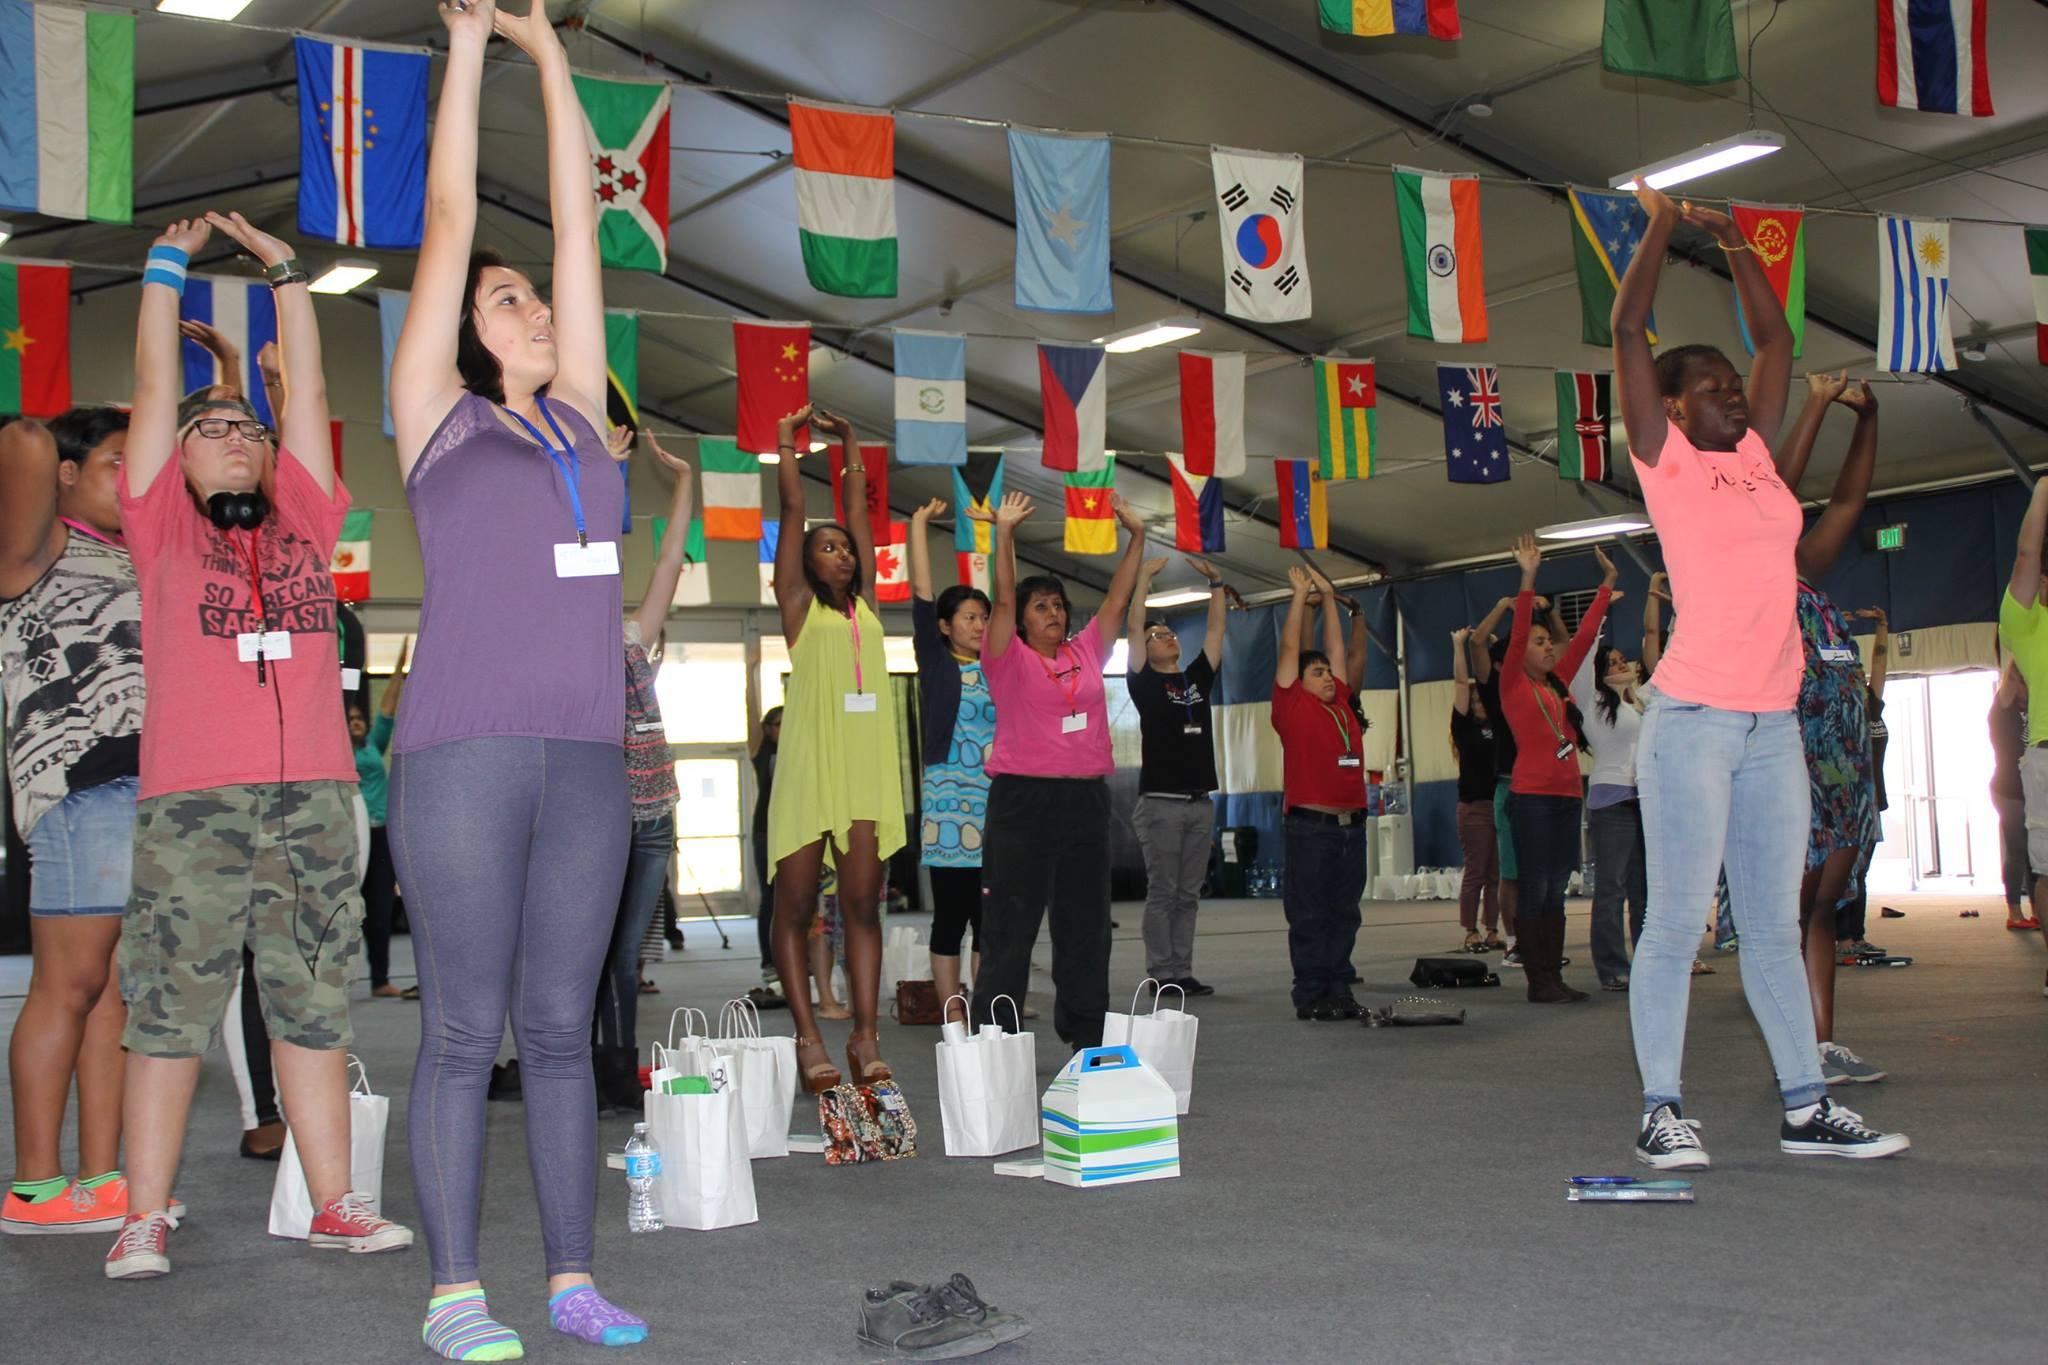 westminster-body-and-brain-yoga-tai-chi-colorado-13